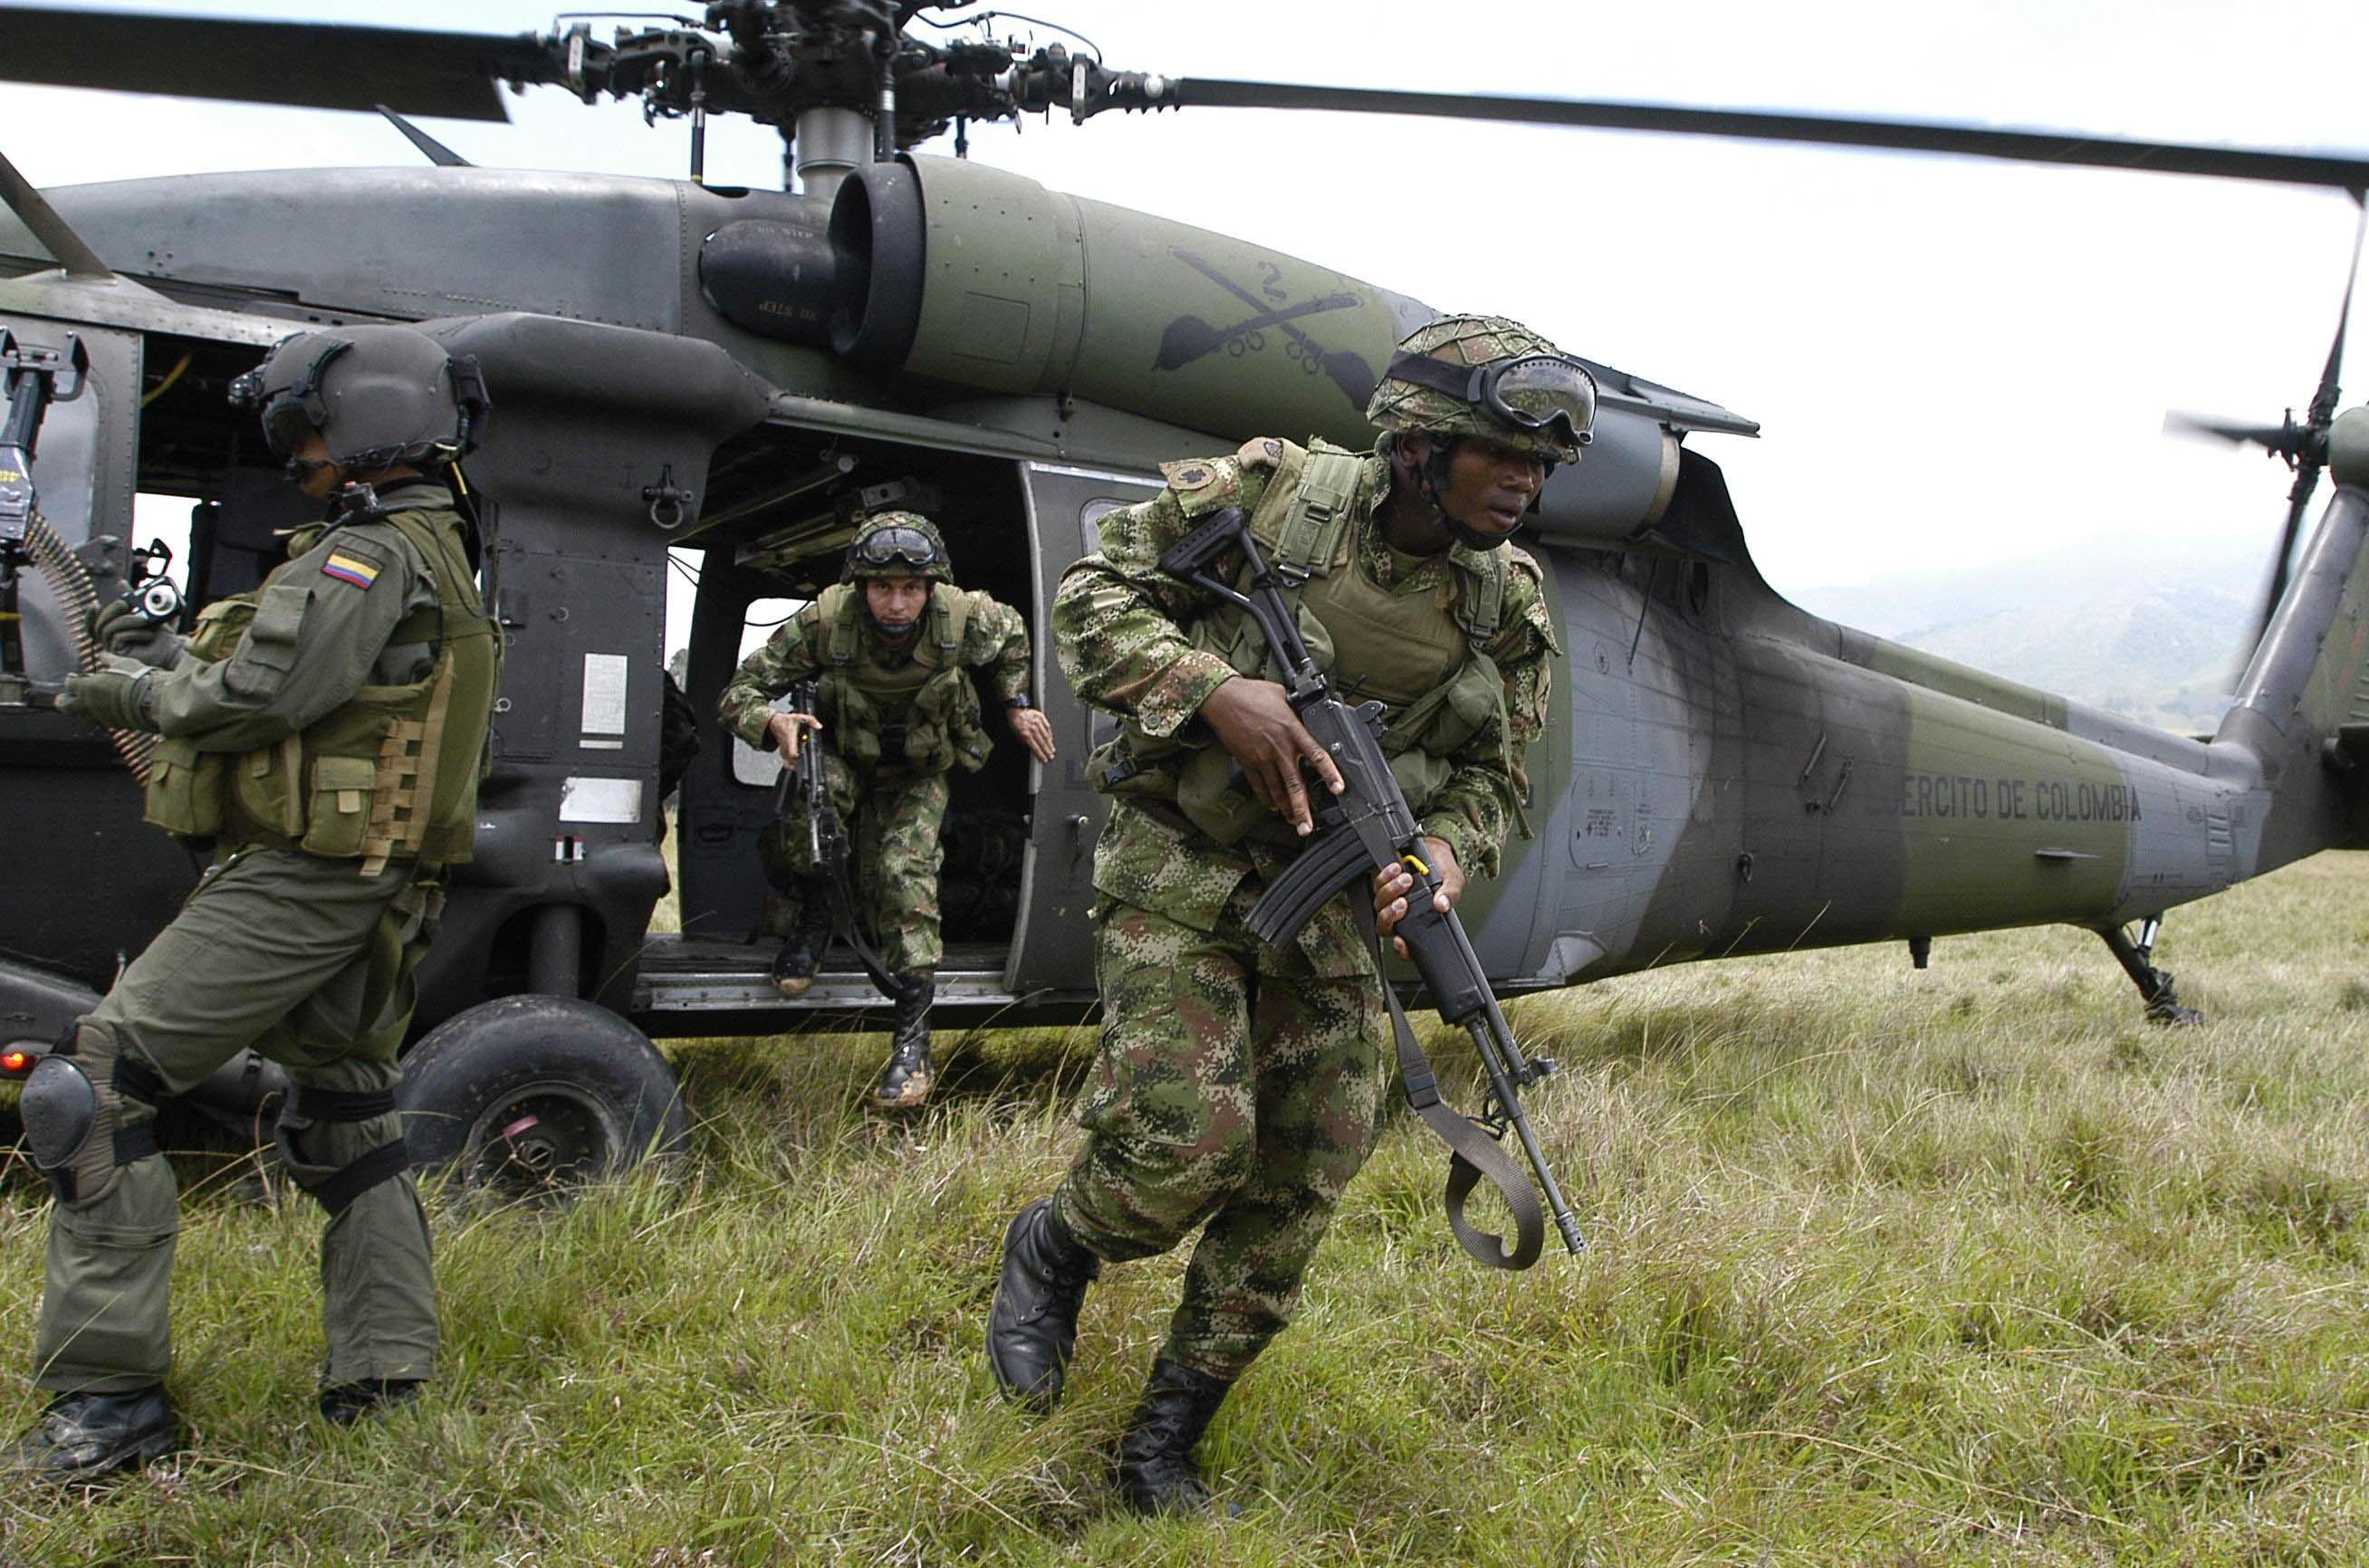 Ejército reporta 10 guerrilleros del Eln muertos en bombardeo